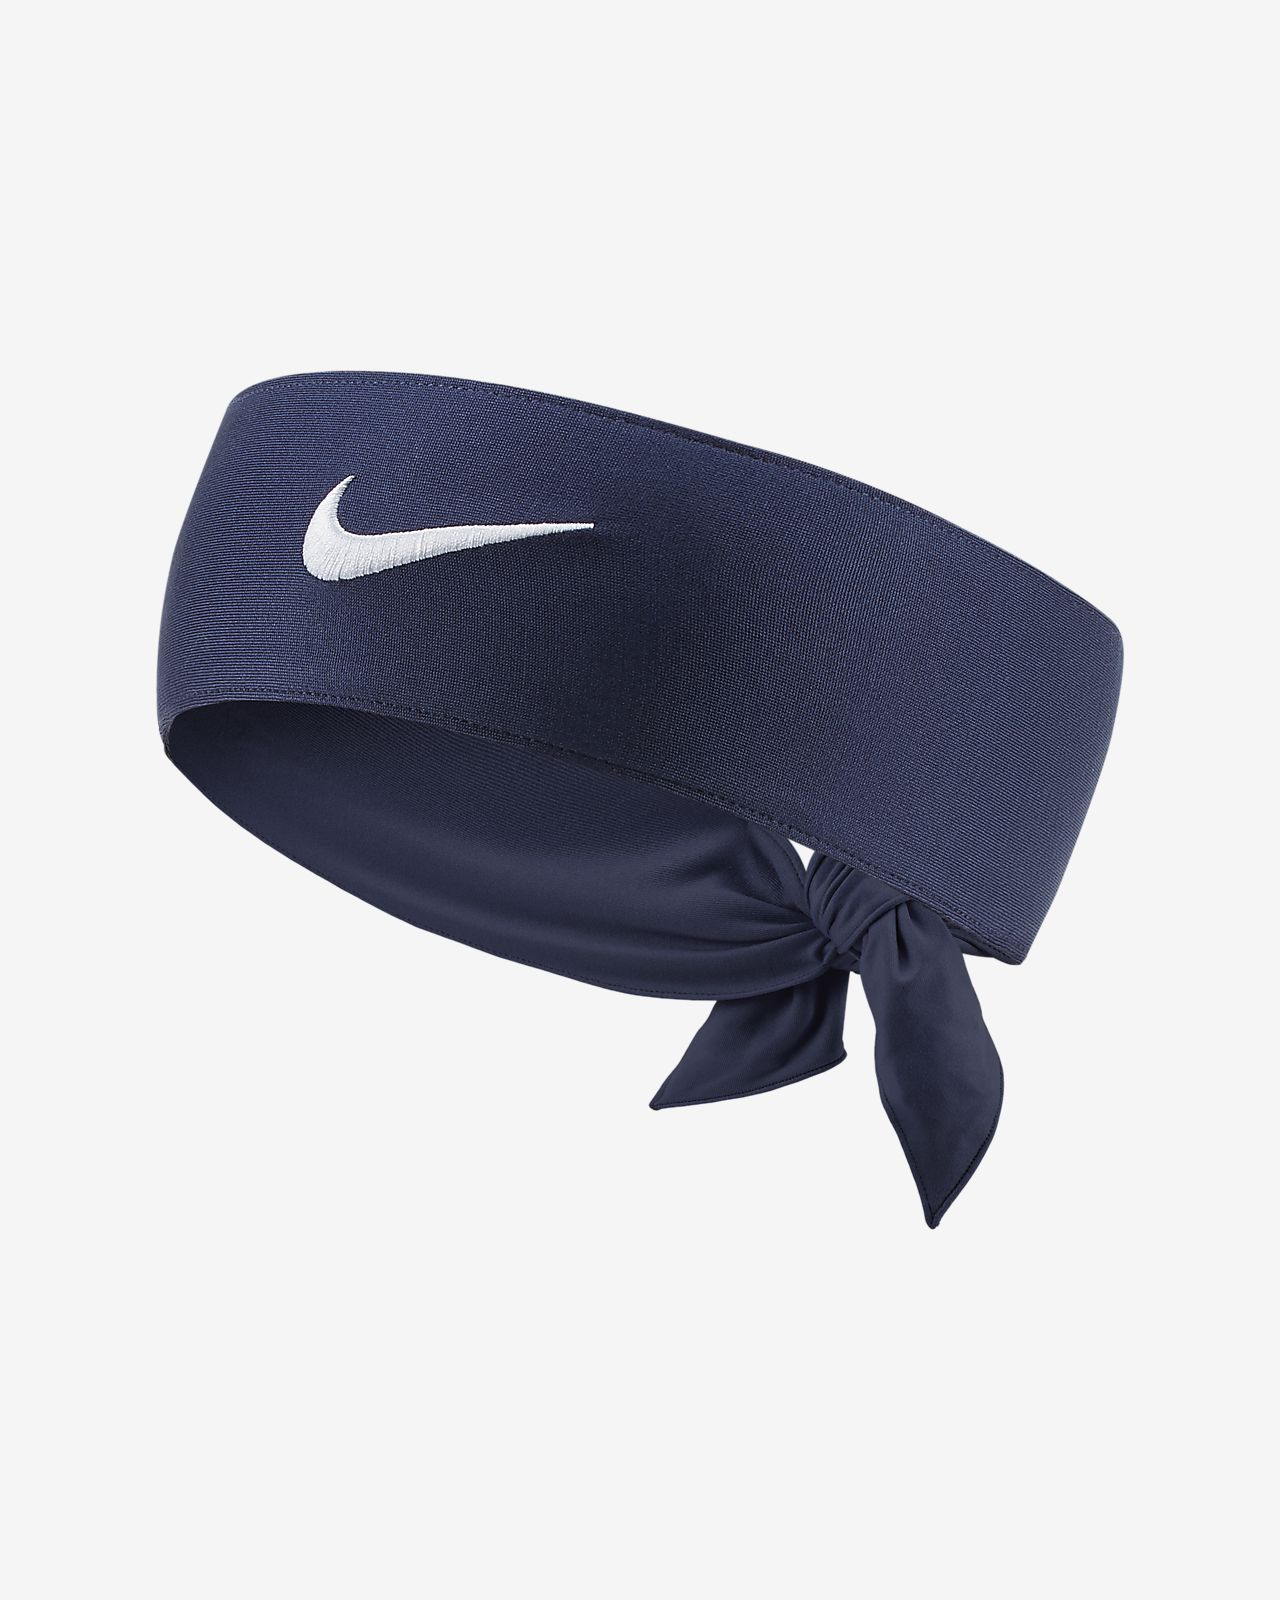 4821995d2e52 NikeCourt Dri-FIT 2.0 Tennis Head Tie. Nike.com